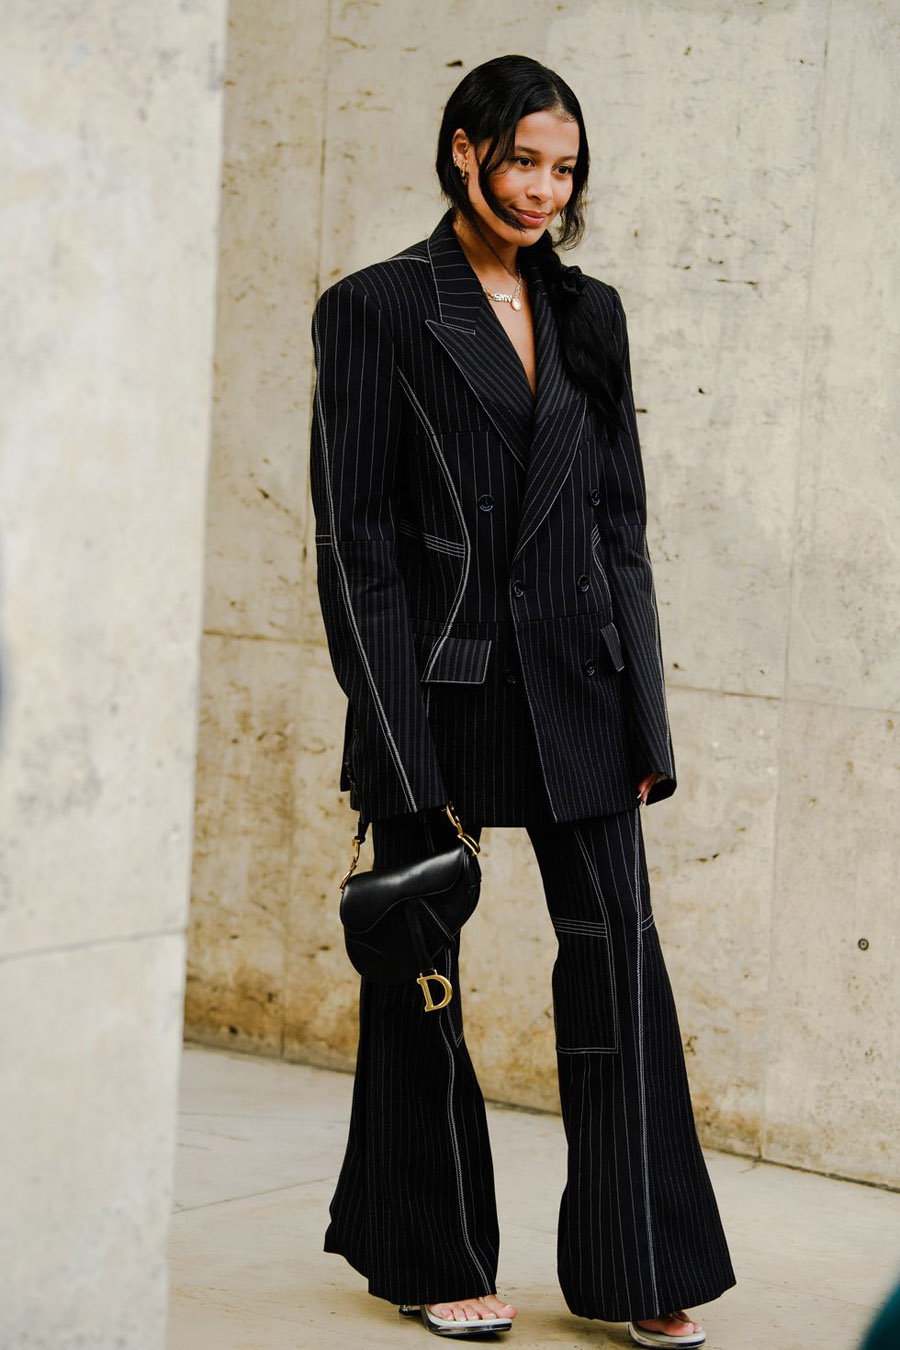 paris-fashion-week-pfw-street-style-ss20-day-2-by-tyler-joe-052-1569745058